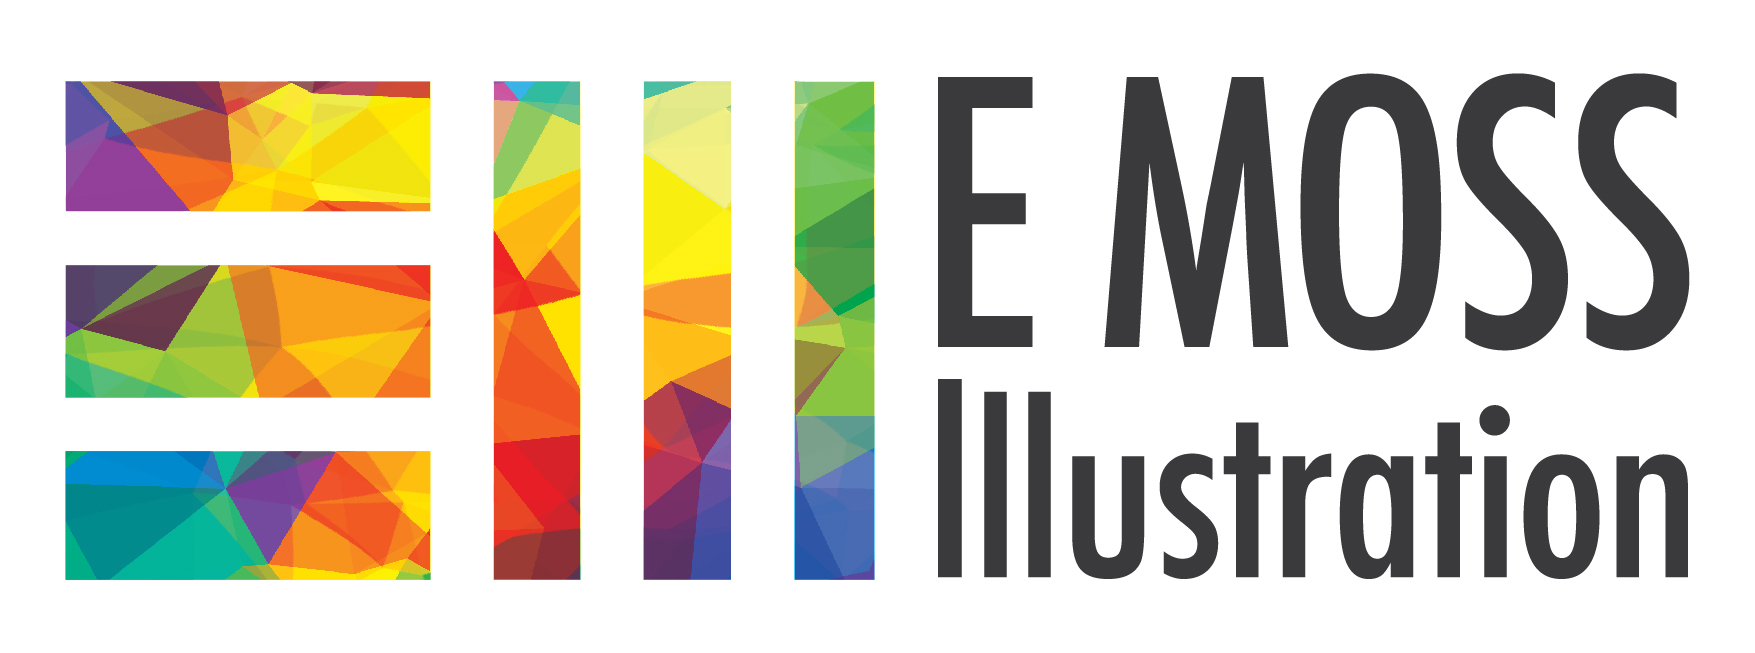 logo emoss 1-10.jpg